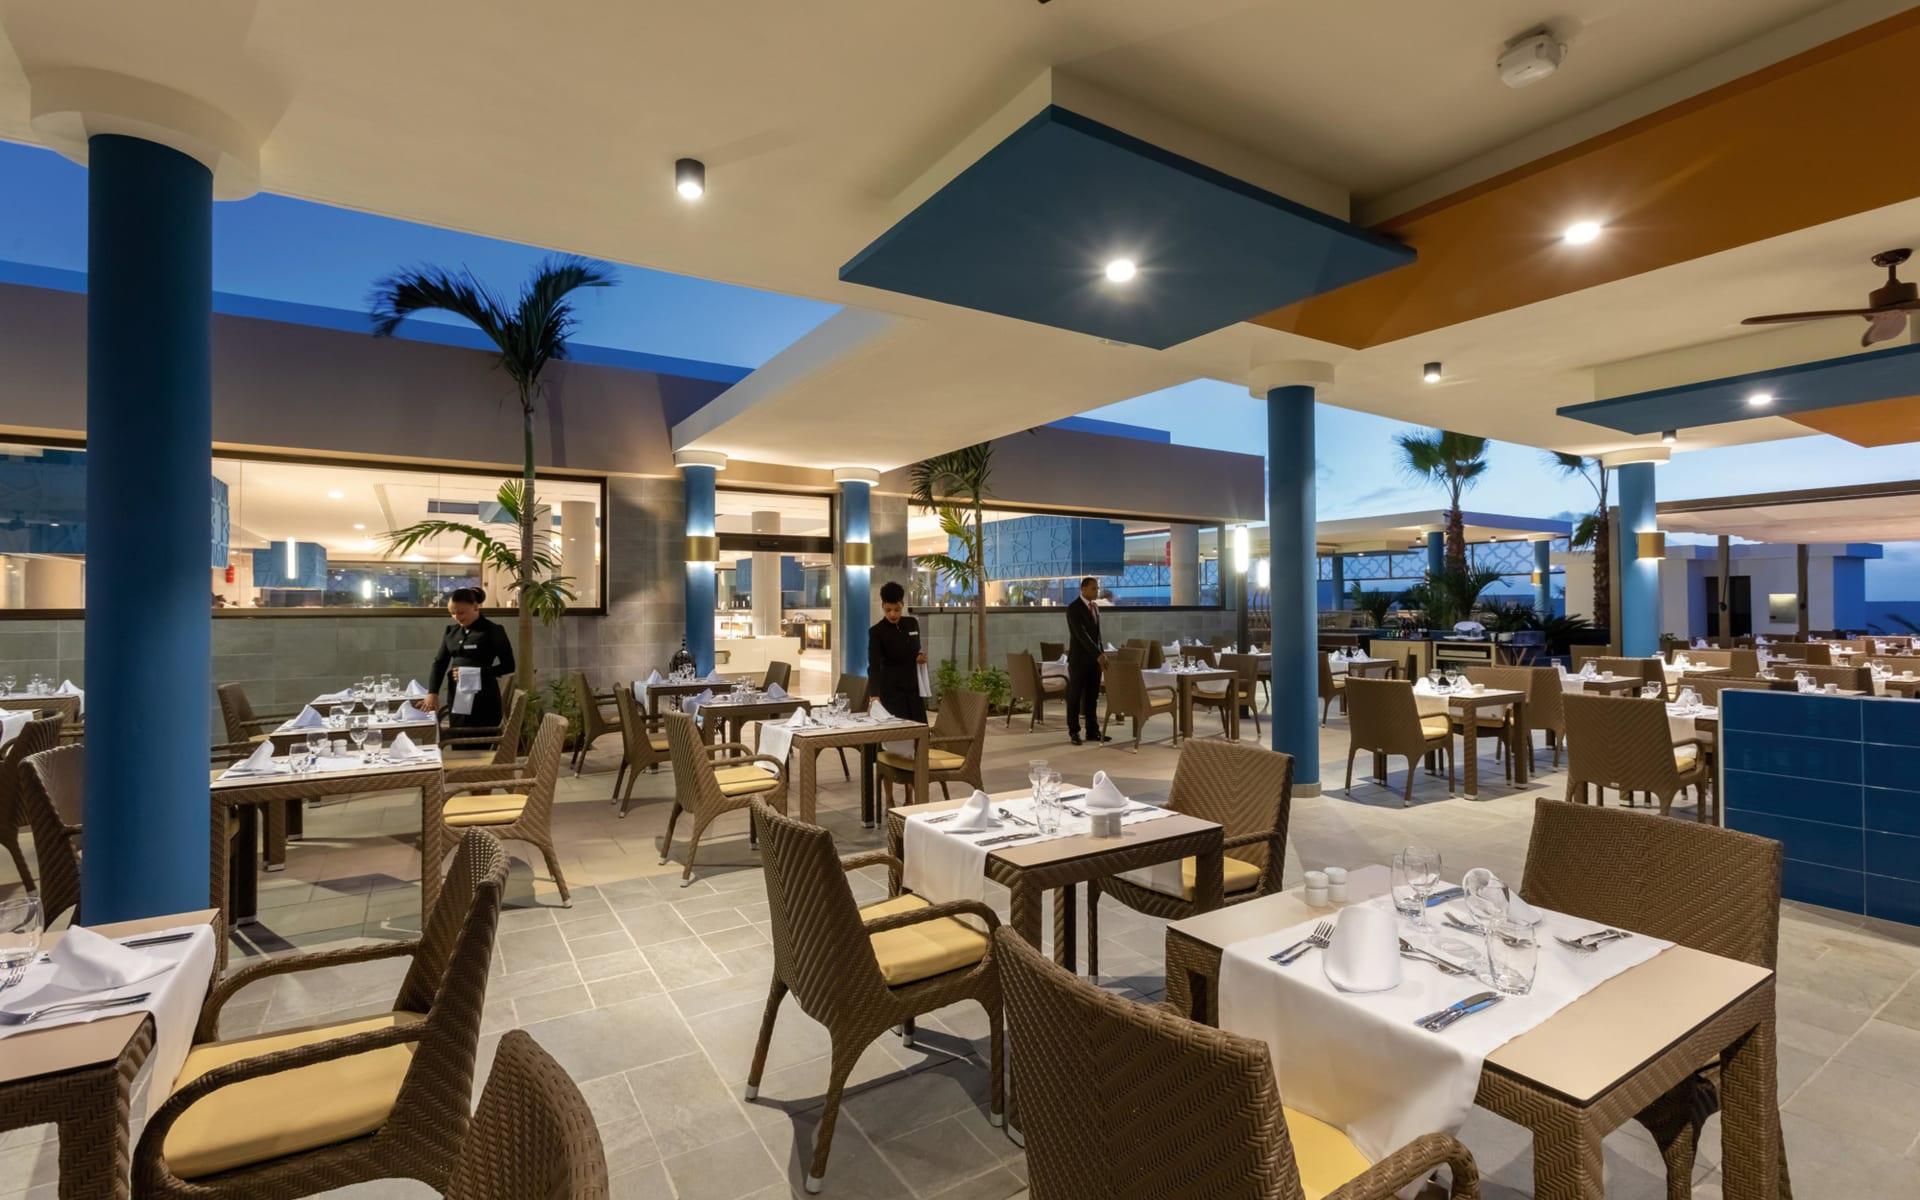 Badeferien im Hotel Riu Palace Boavista ab Praia de Chaves: 2c3d6ac6-1810-4a1d-8ff0-837ecfe54f1c